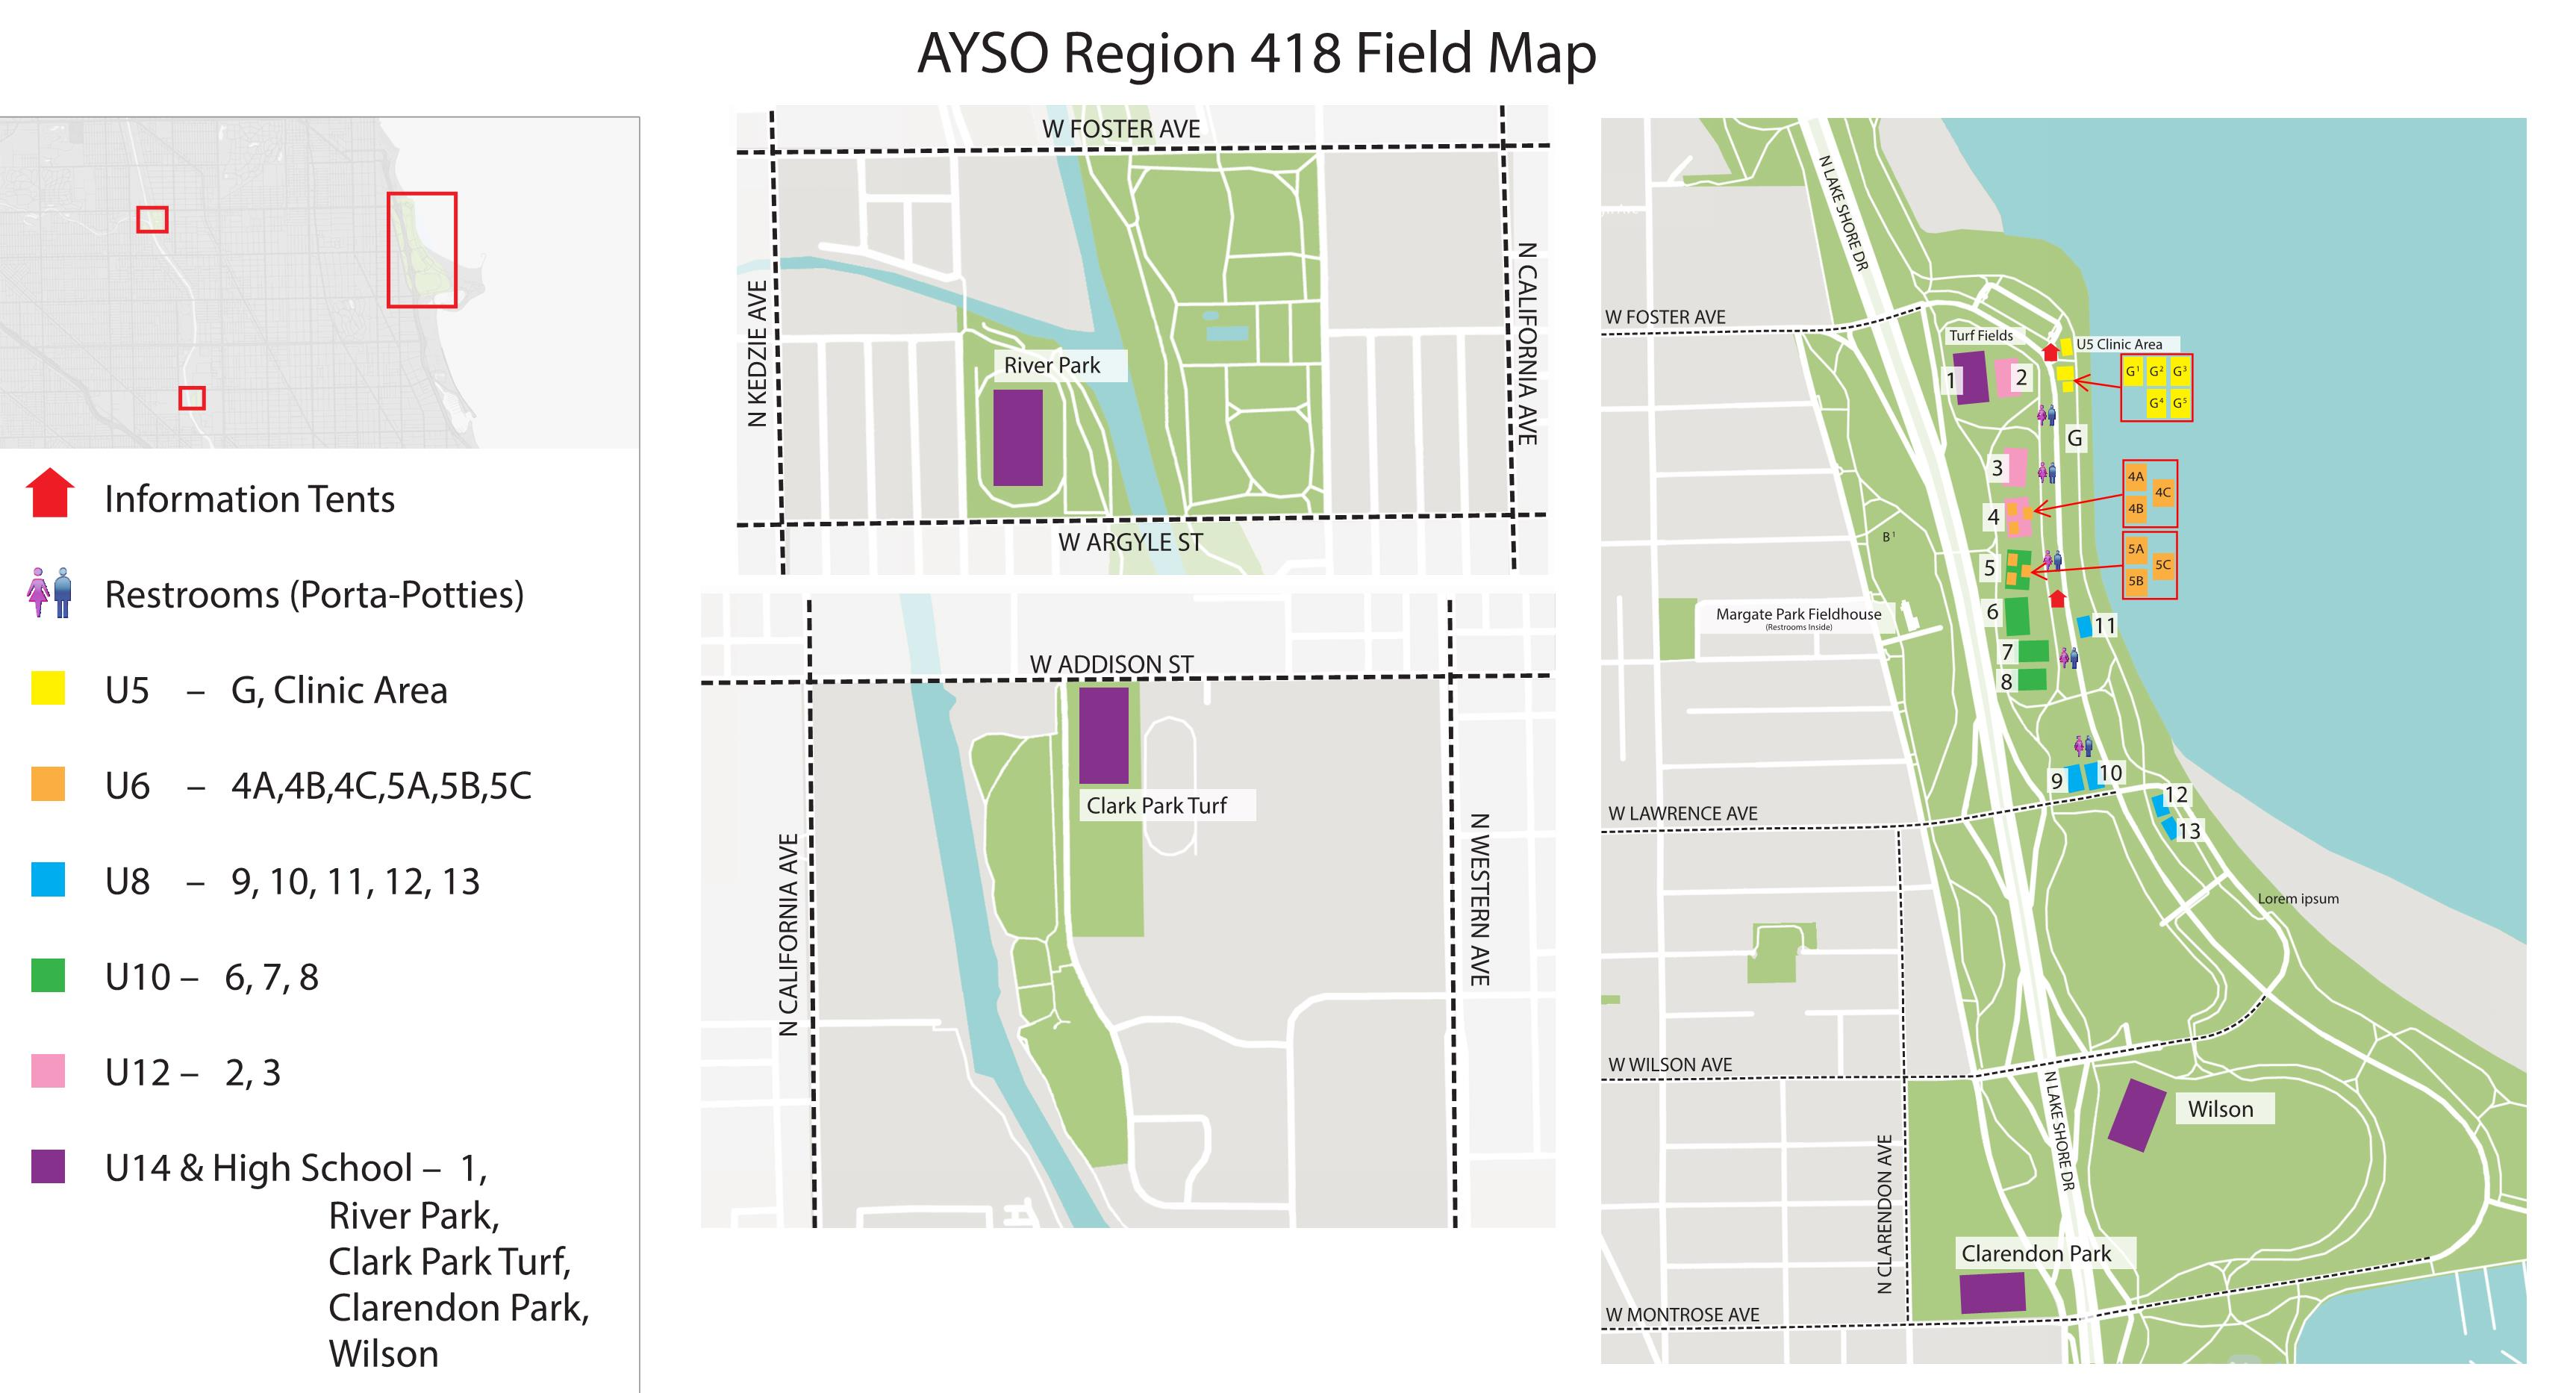 Ayso 418 Field Map Field Locations